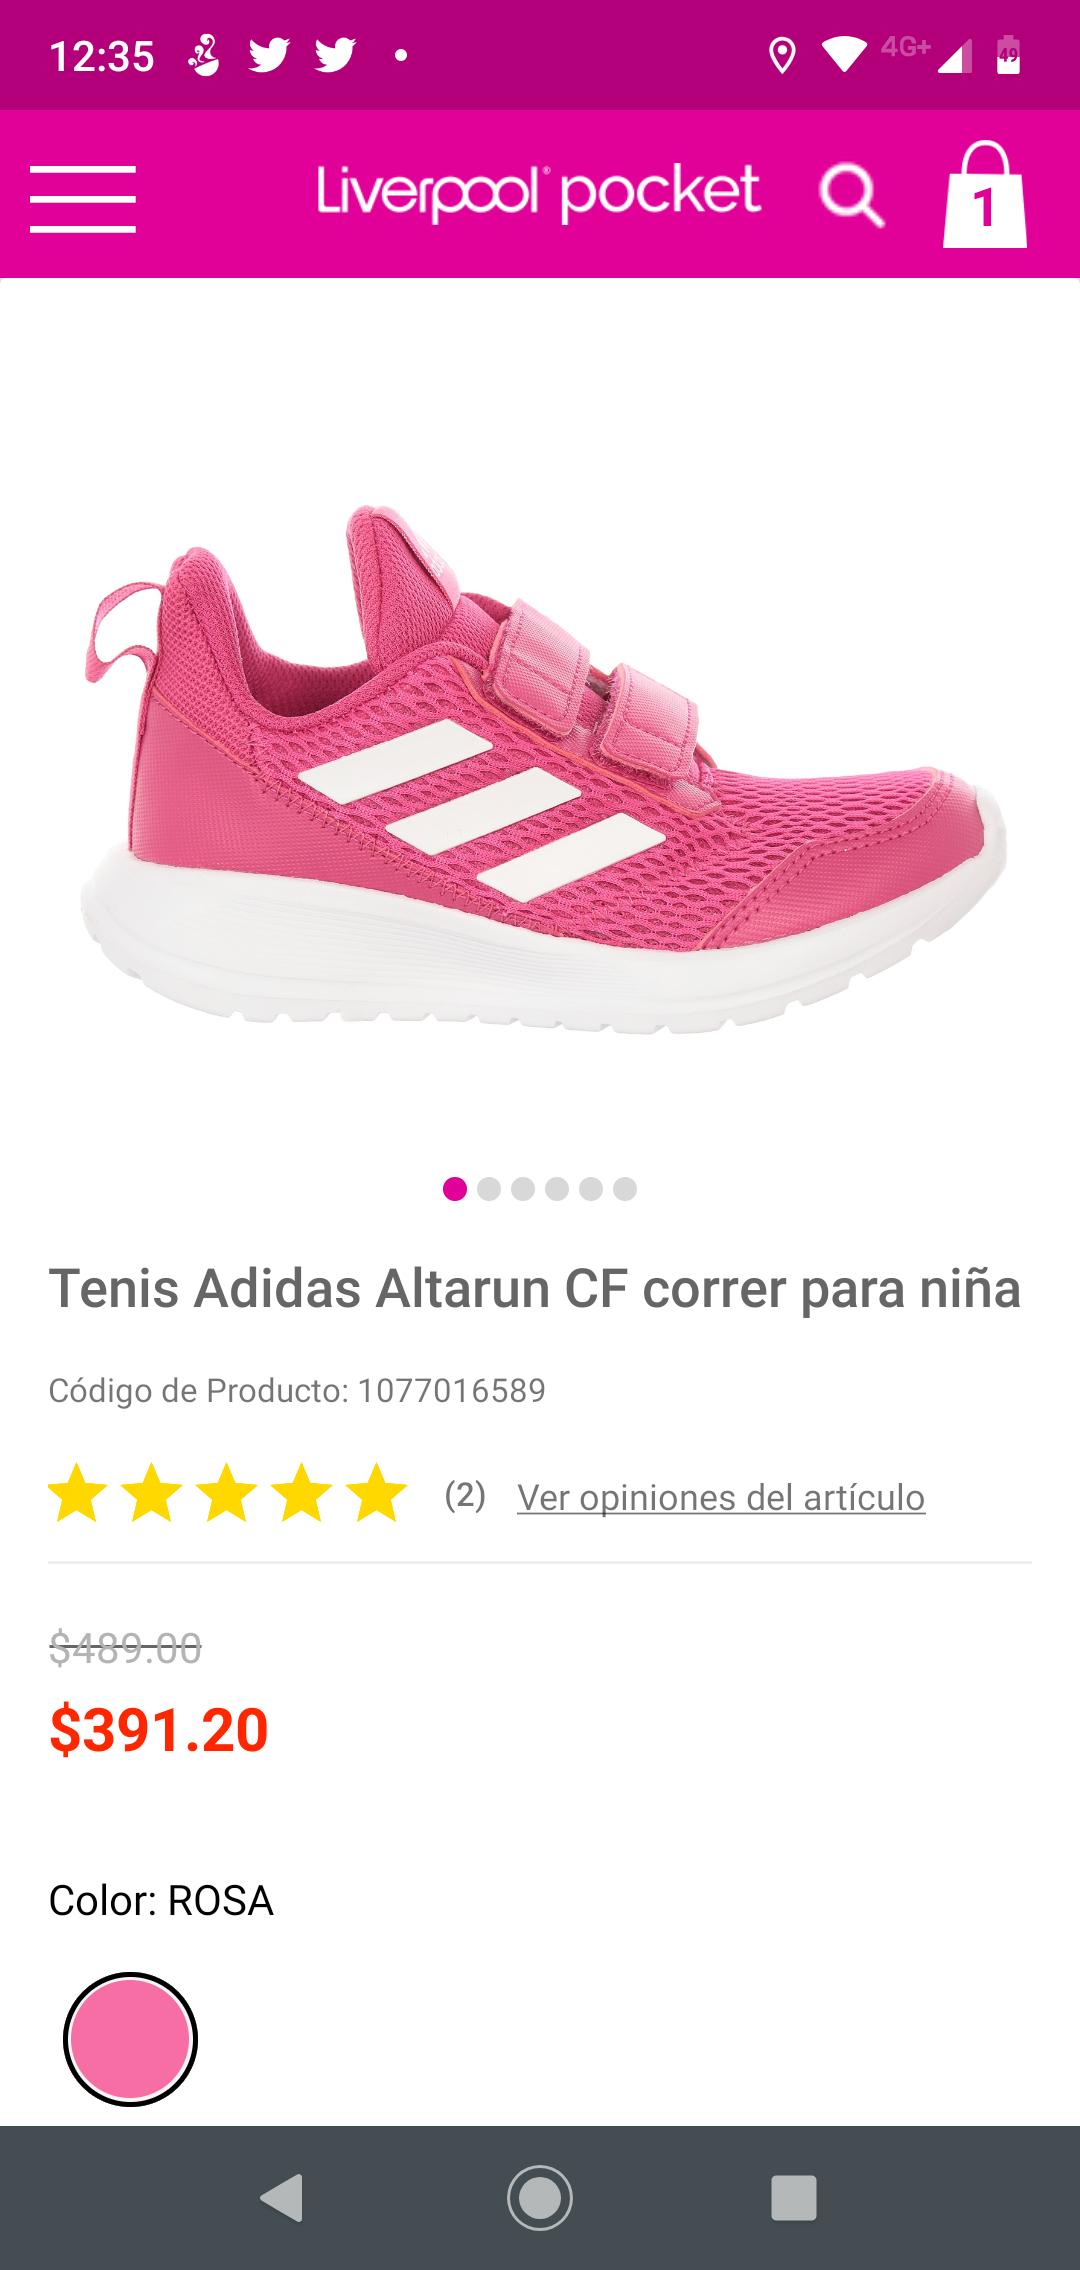 Liverpool: Tenis Adidas AltaRun para niña.